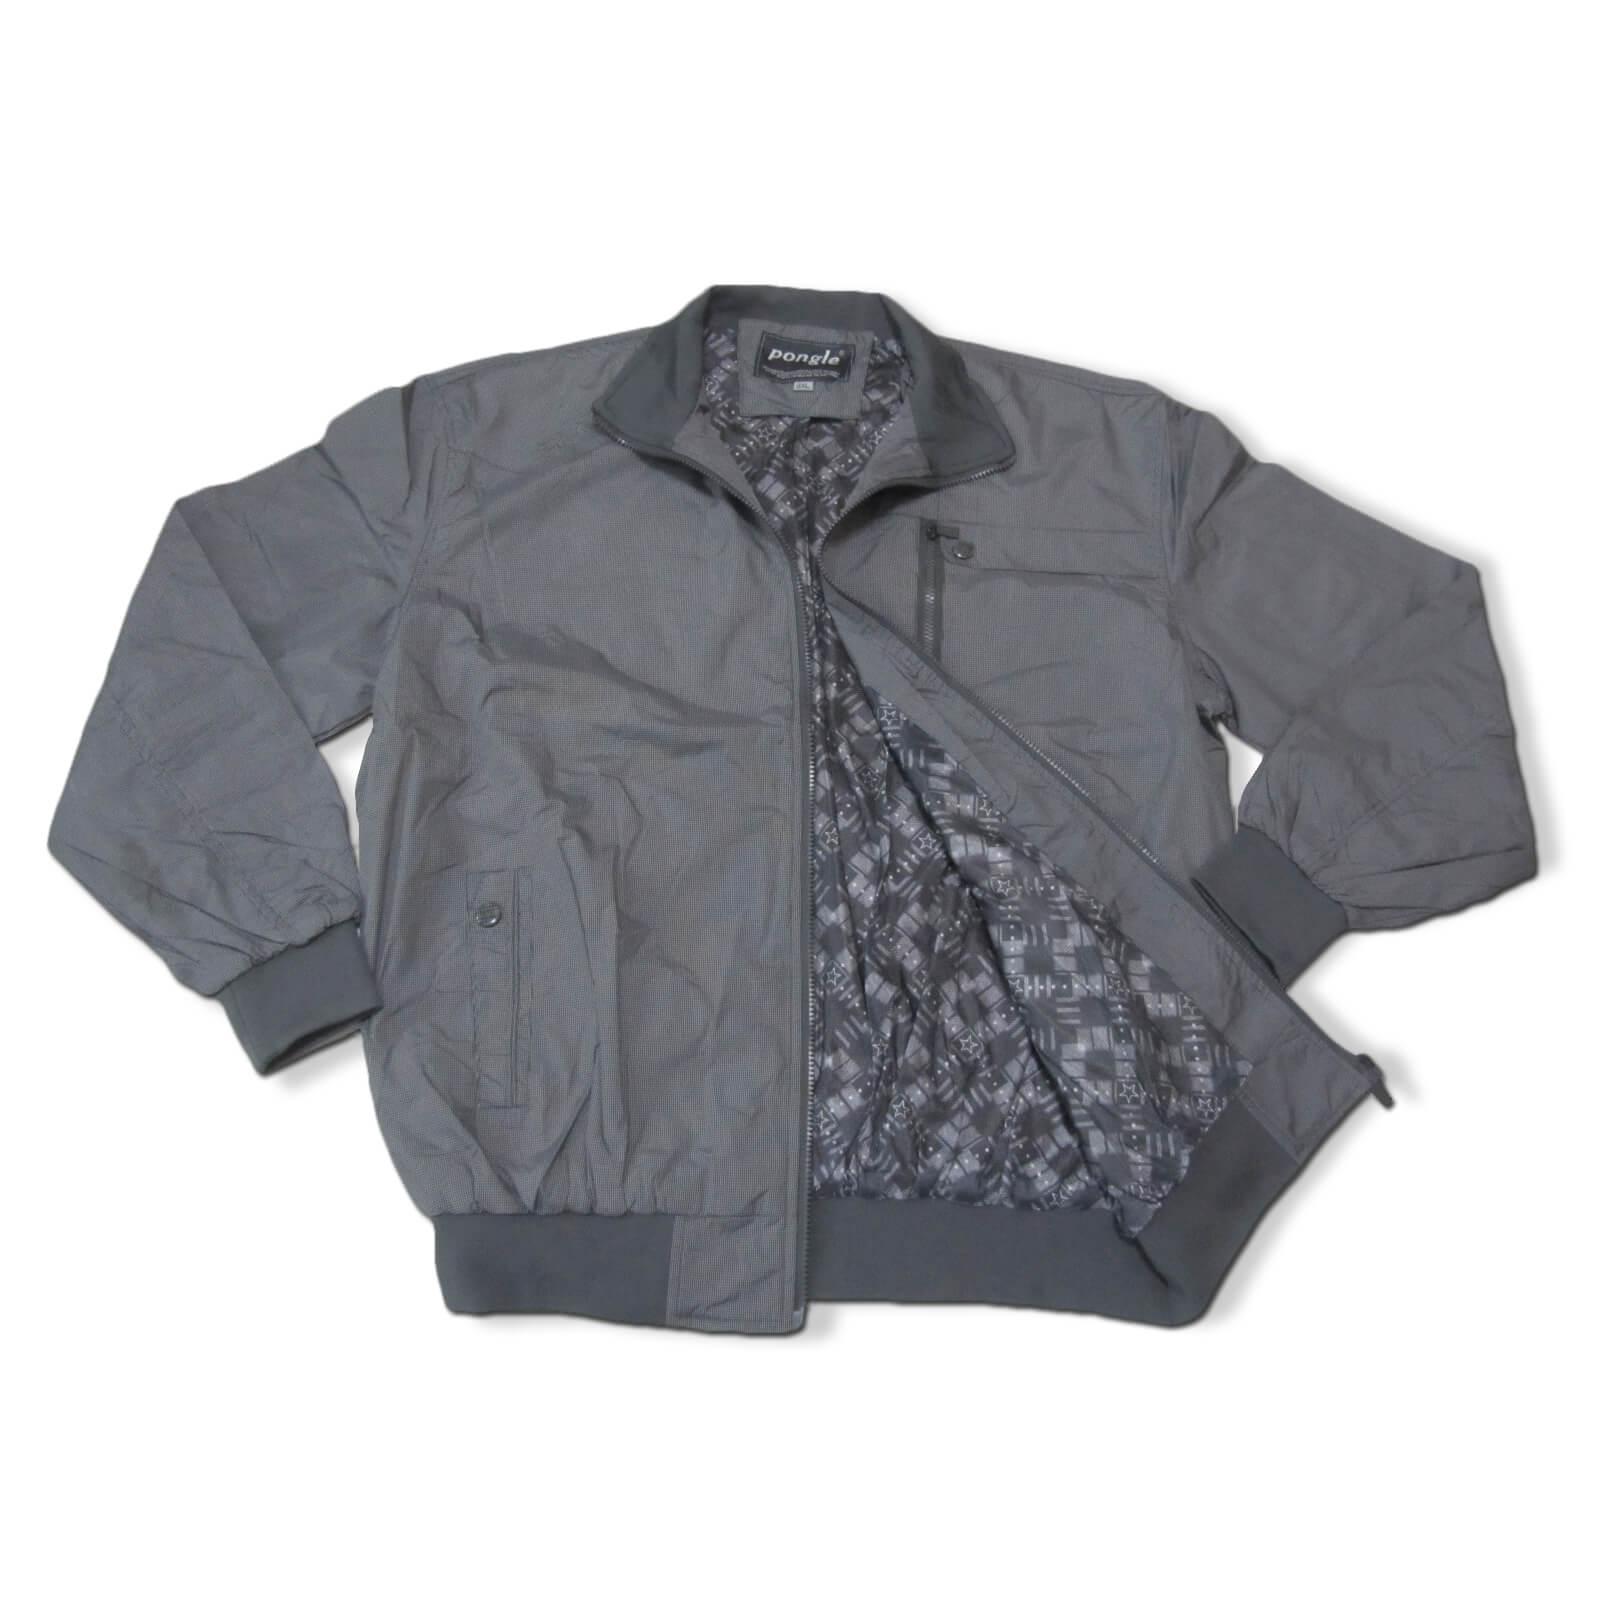 sun-e加大尺碼風衣外套、加大尺碼細格紋外套、加大尺碼夾克外套、加大尺碼防風外套、加大尺碼騎士外套(312-8882-08)藍綠色細格紋、(312-8882-21)灰色細格紋 胸圍:3L 4L(58~60英吋) [實體店面保障] 3